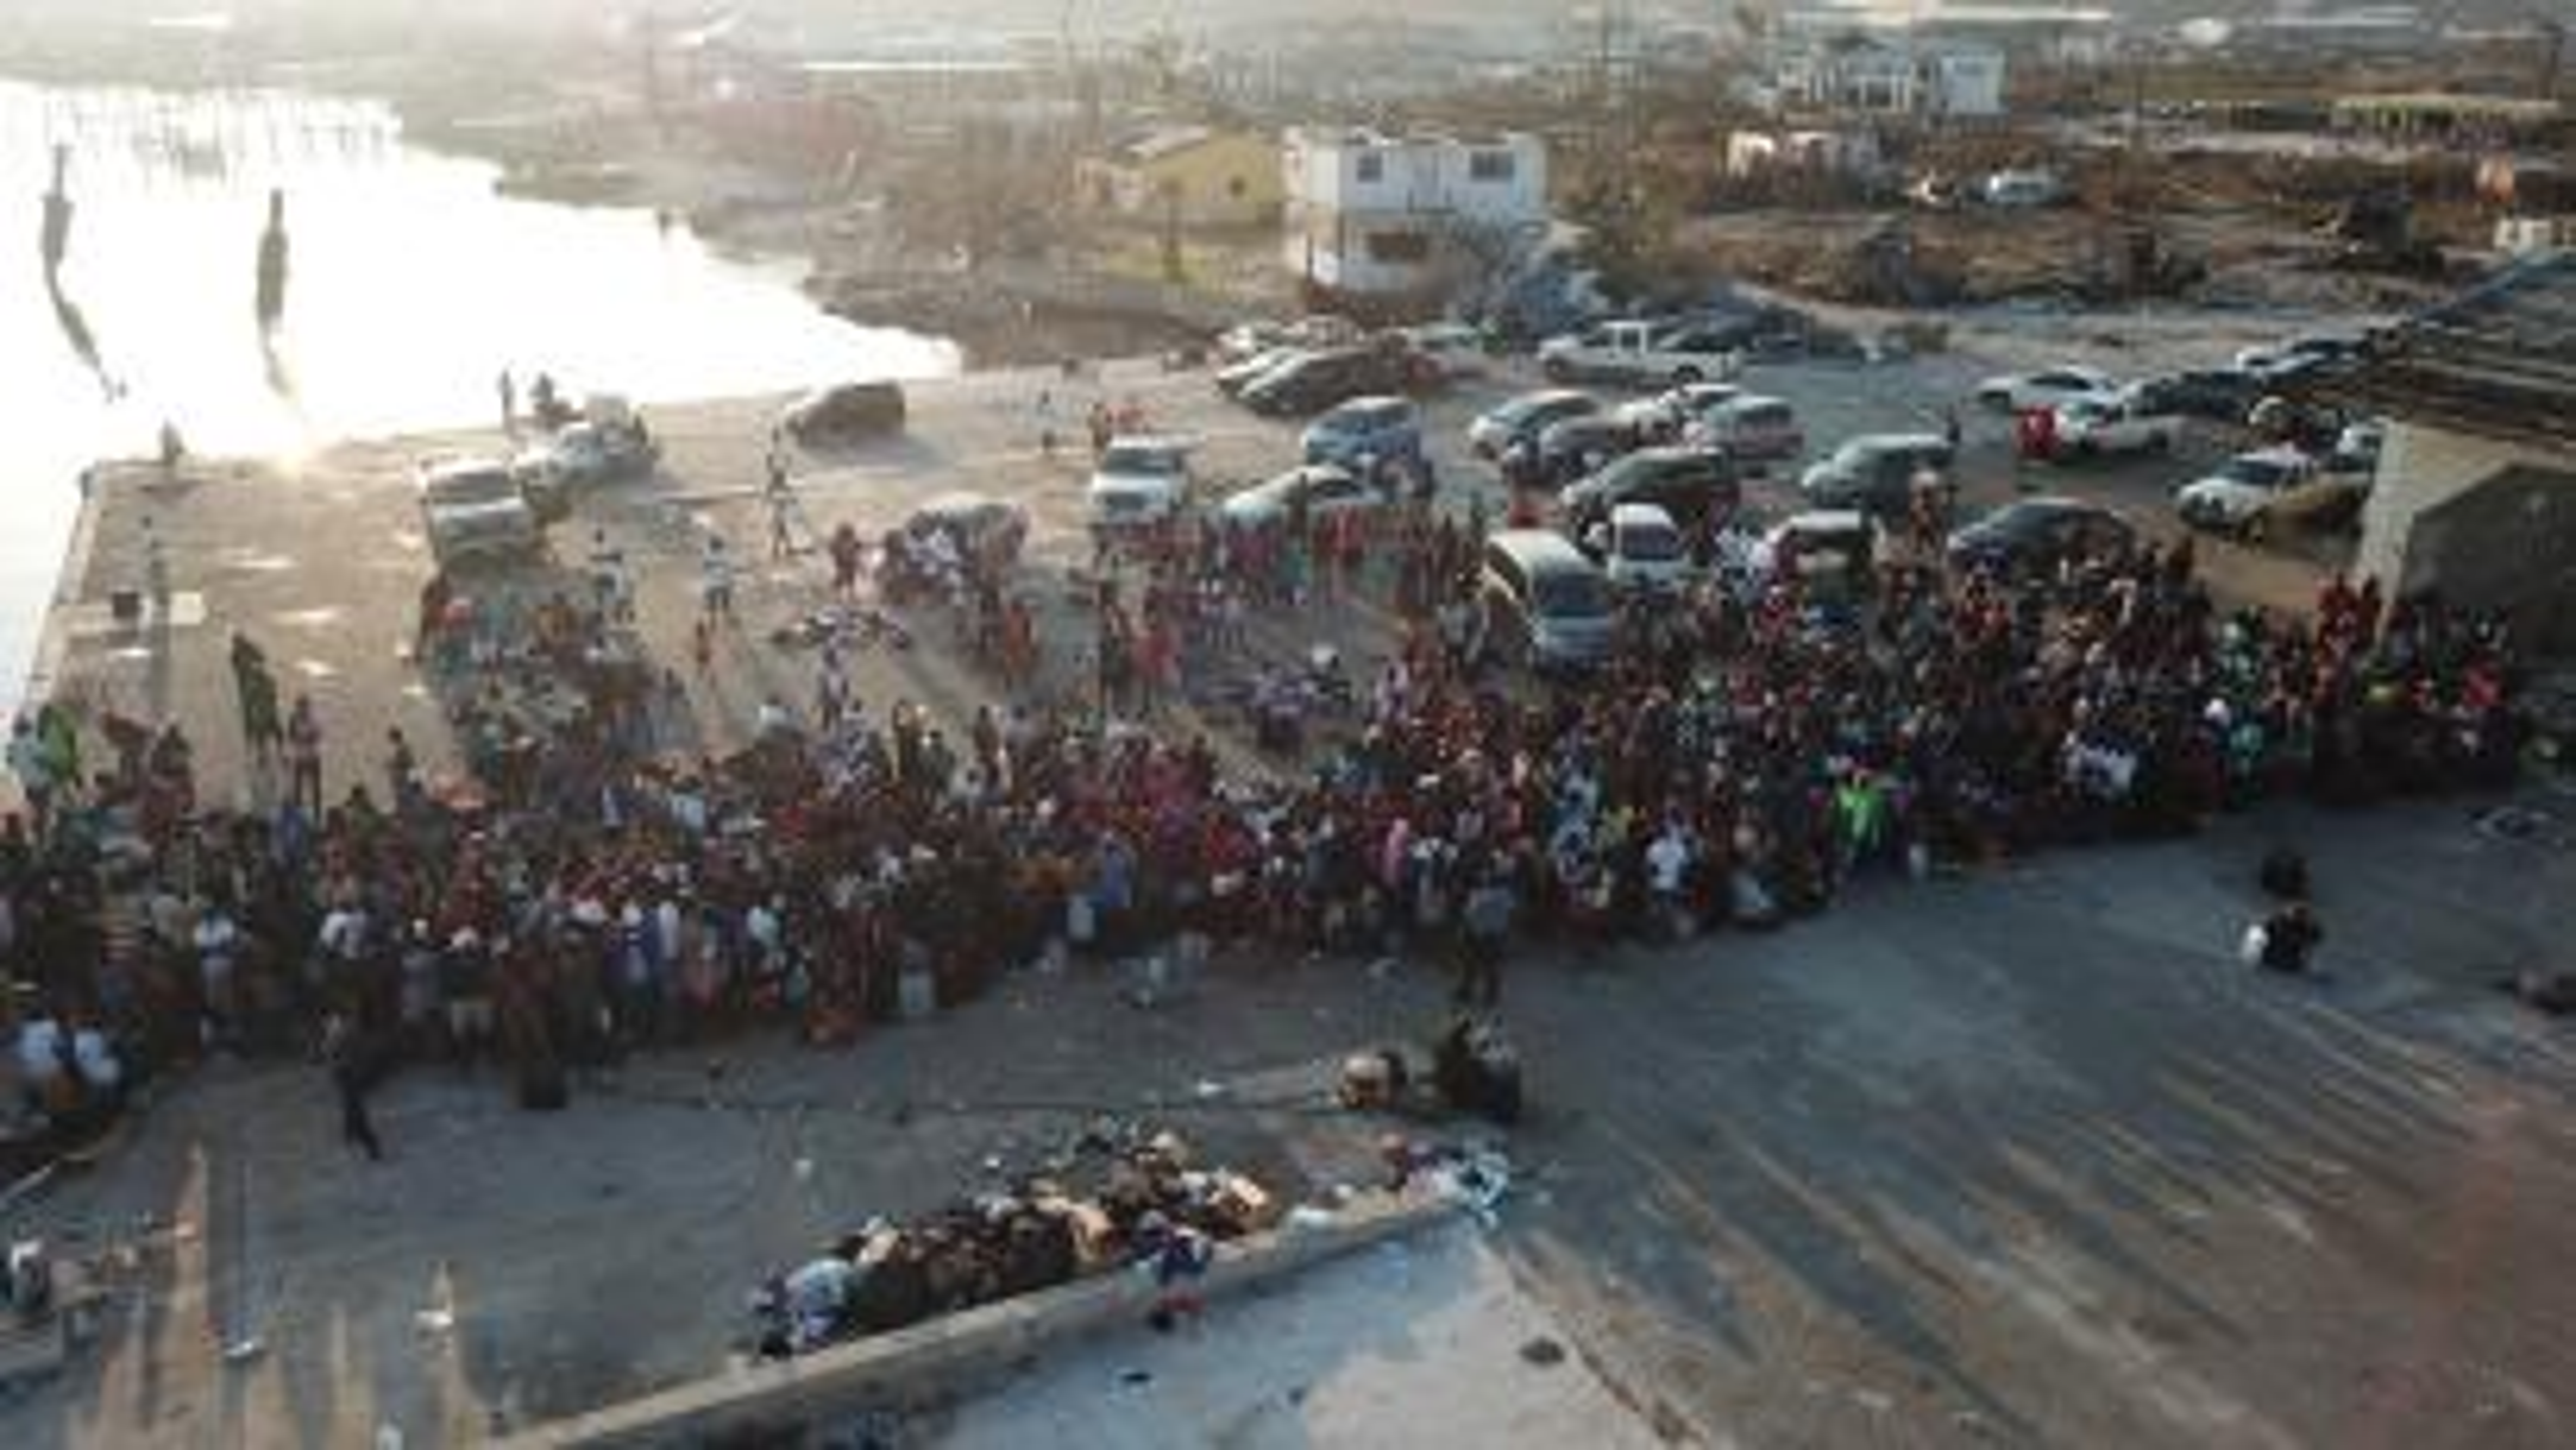 People wait to board a ferry in Freeport, Bahamas